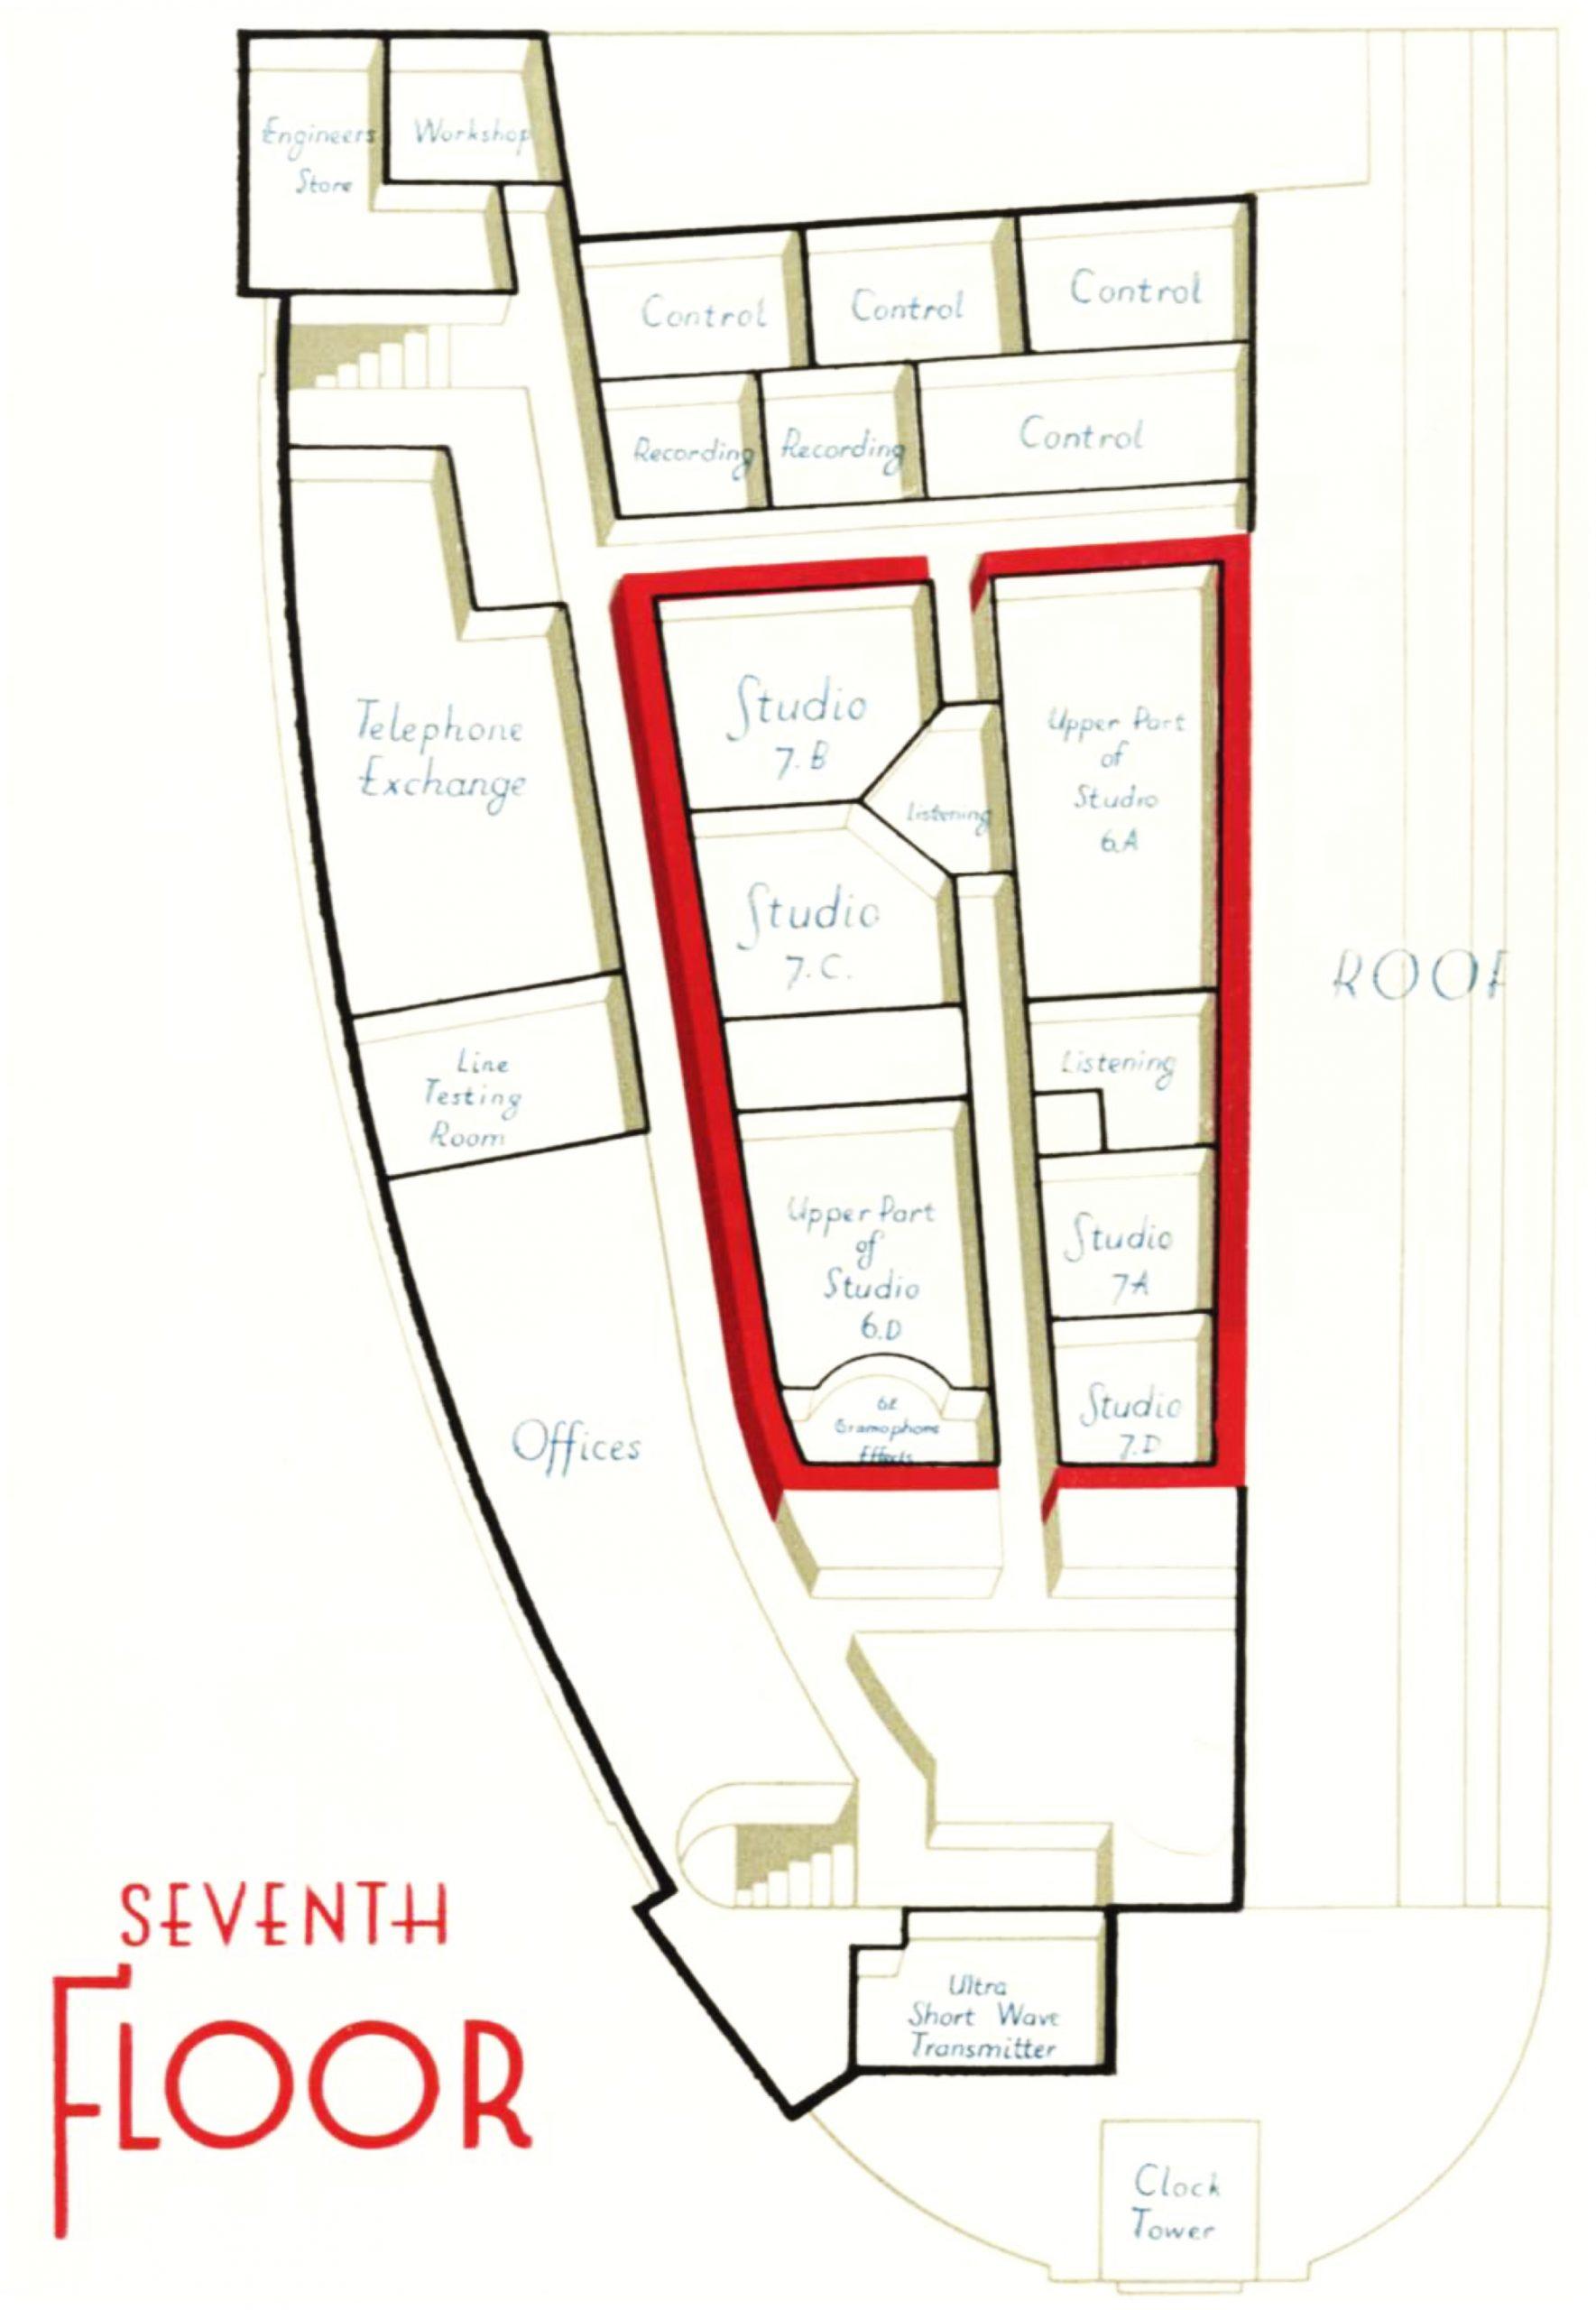 Diagram of the 7th floor